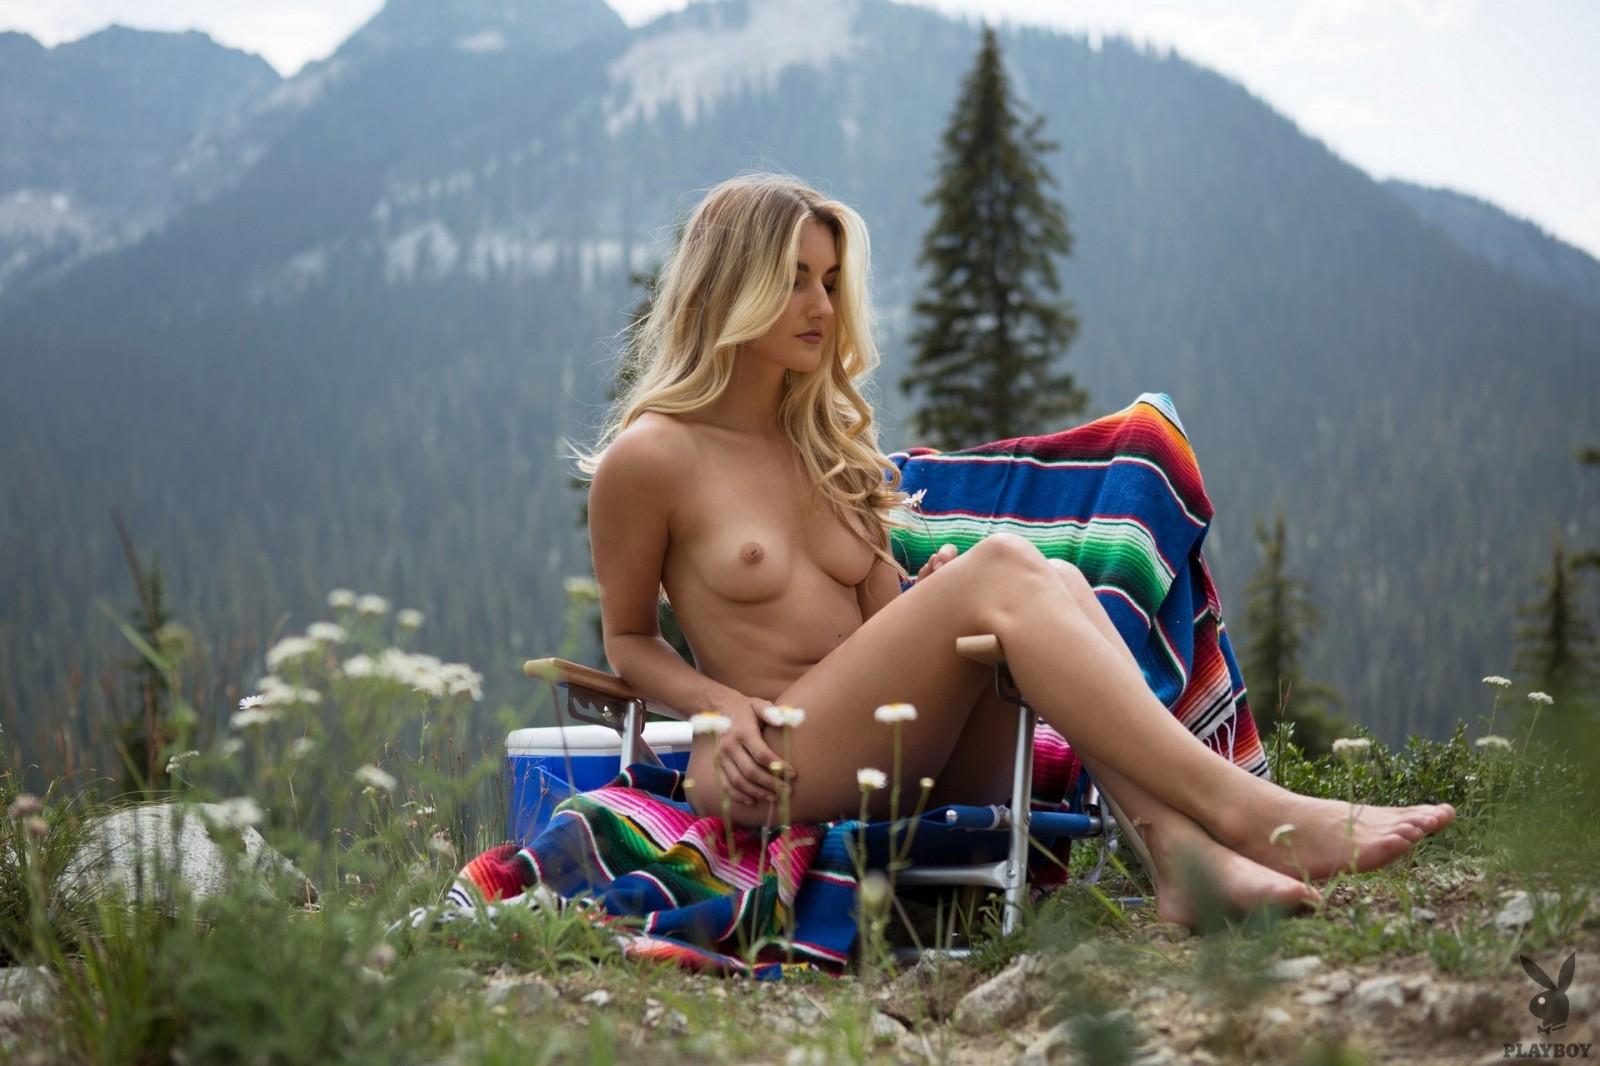 Nude girl on birthday card